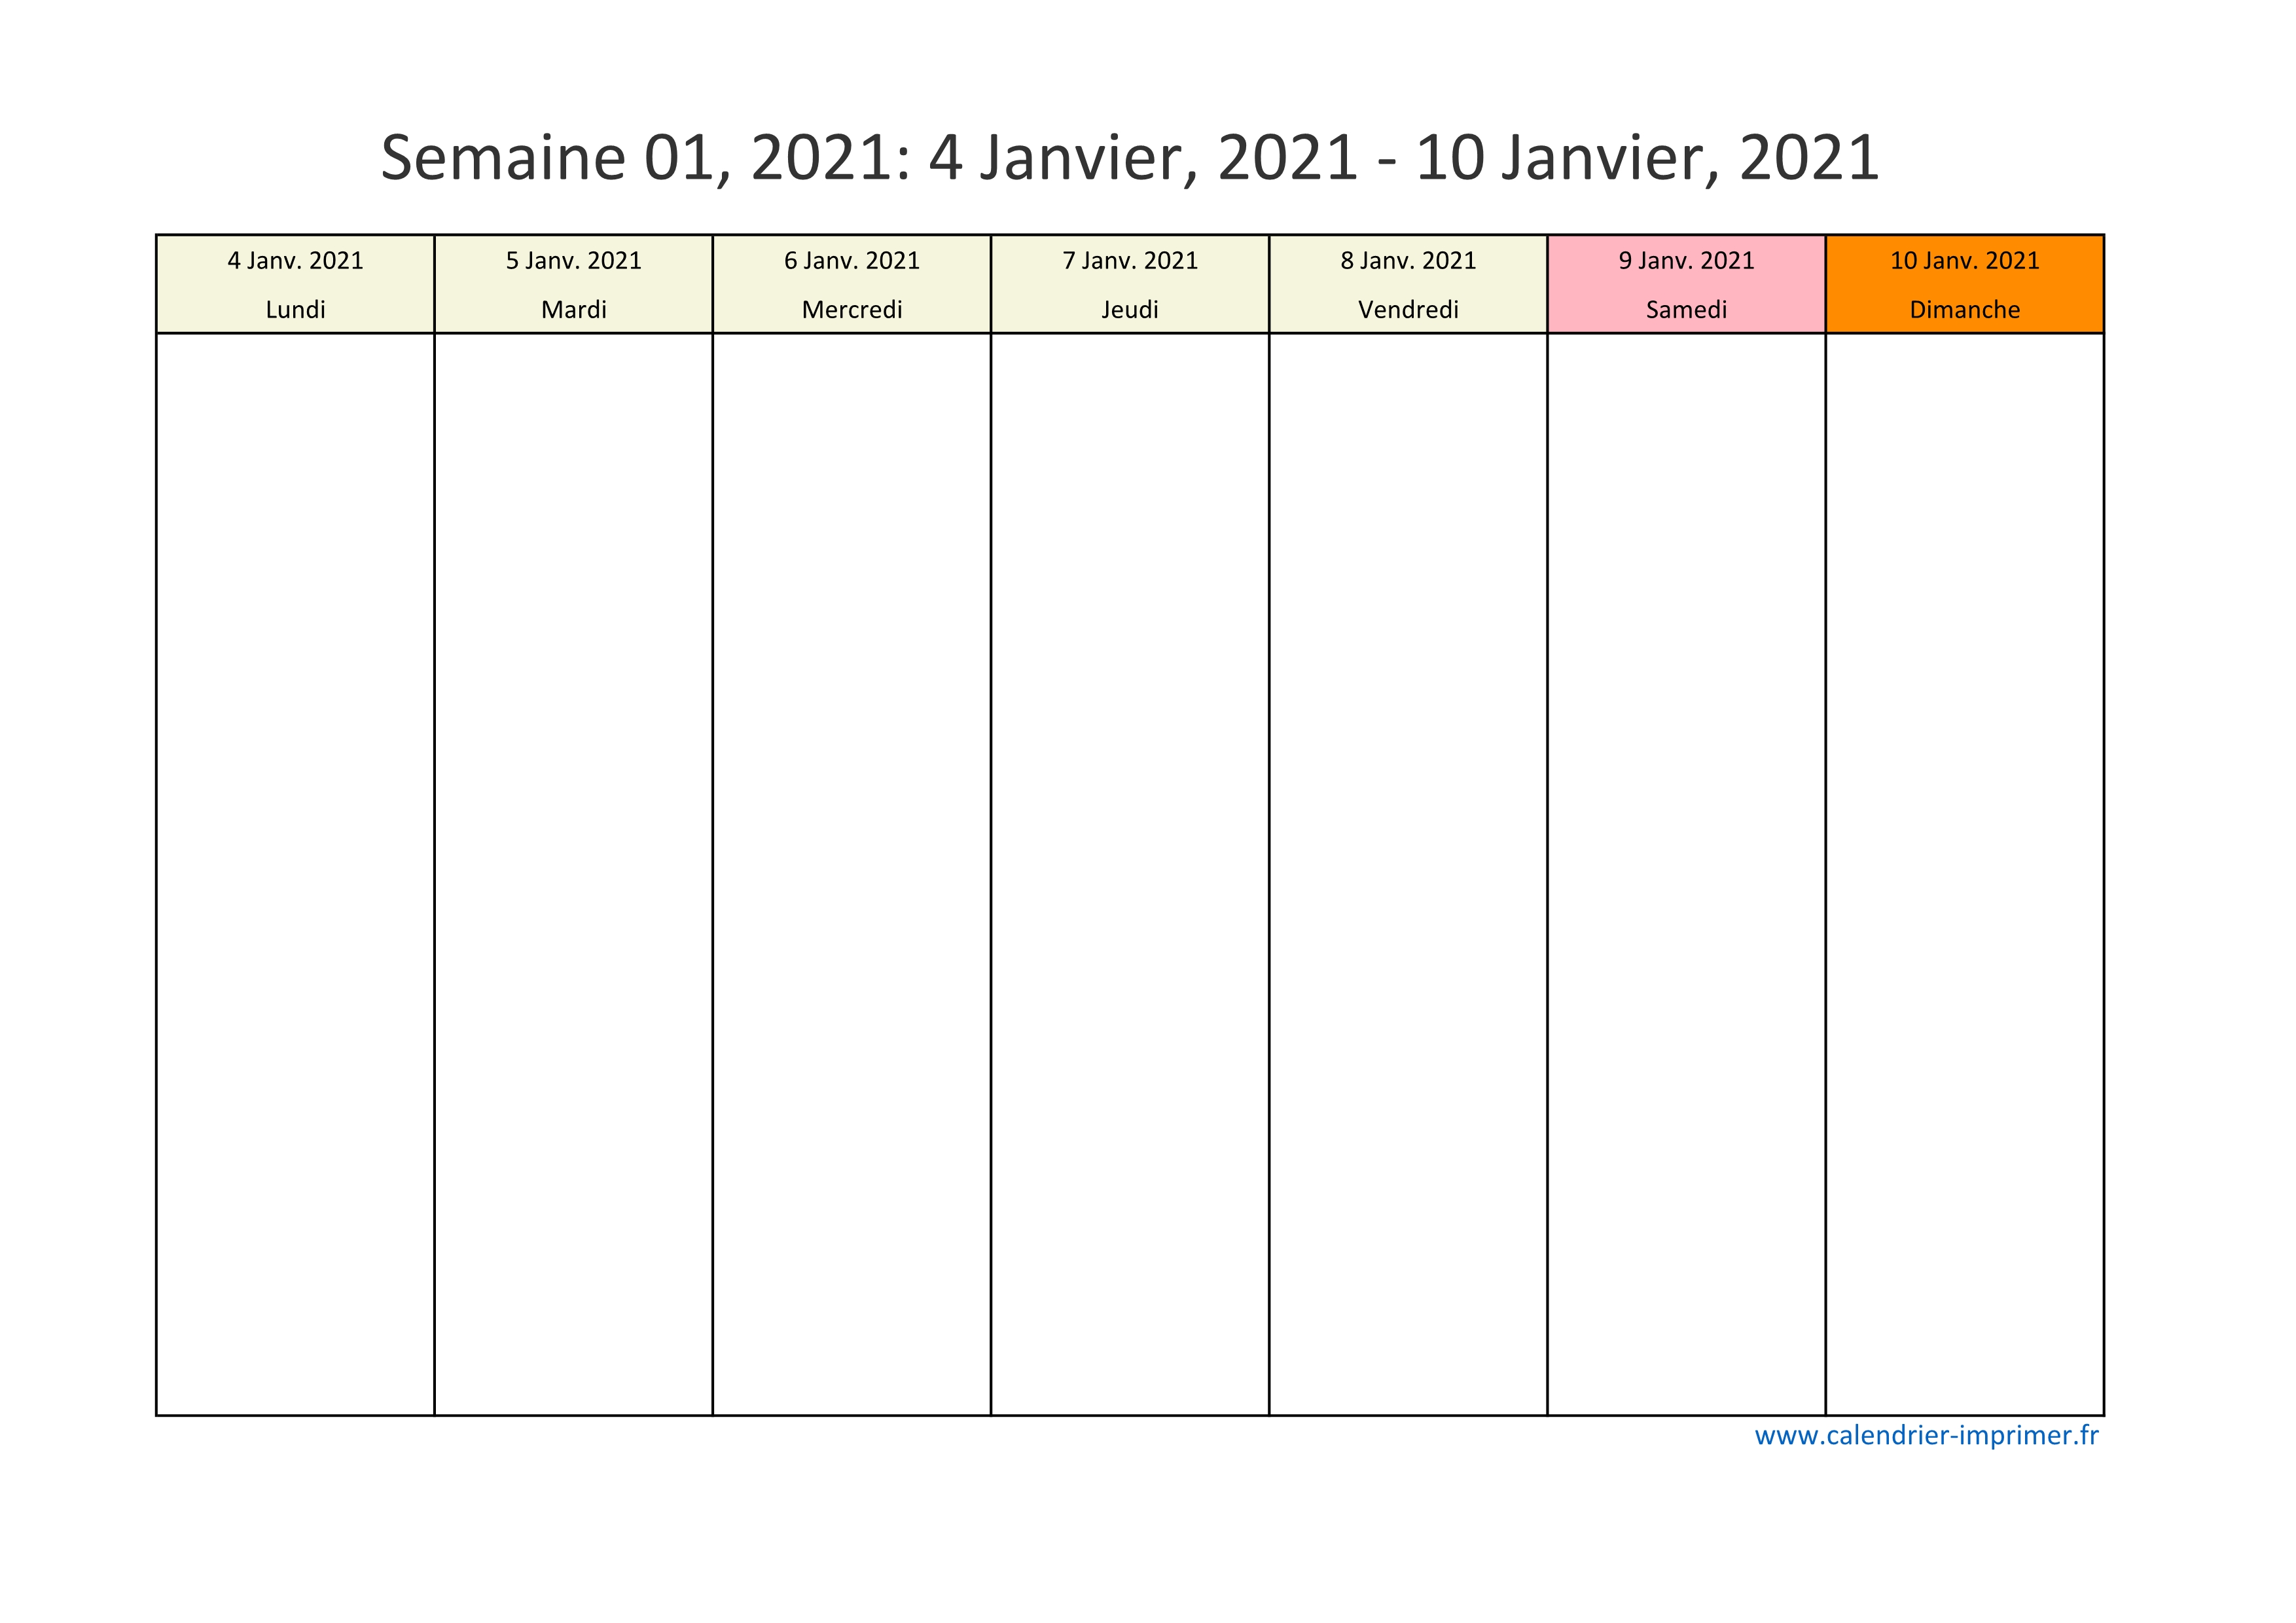 Calendrier 2021 semaine (planning, hebdomadaire, semainier)